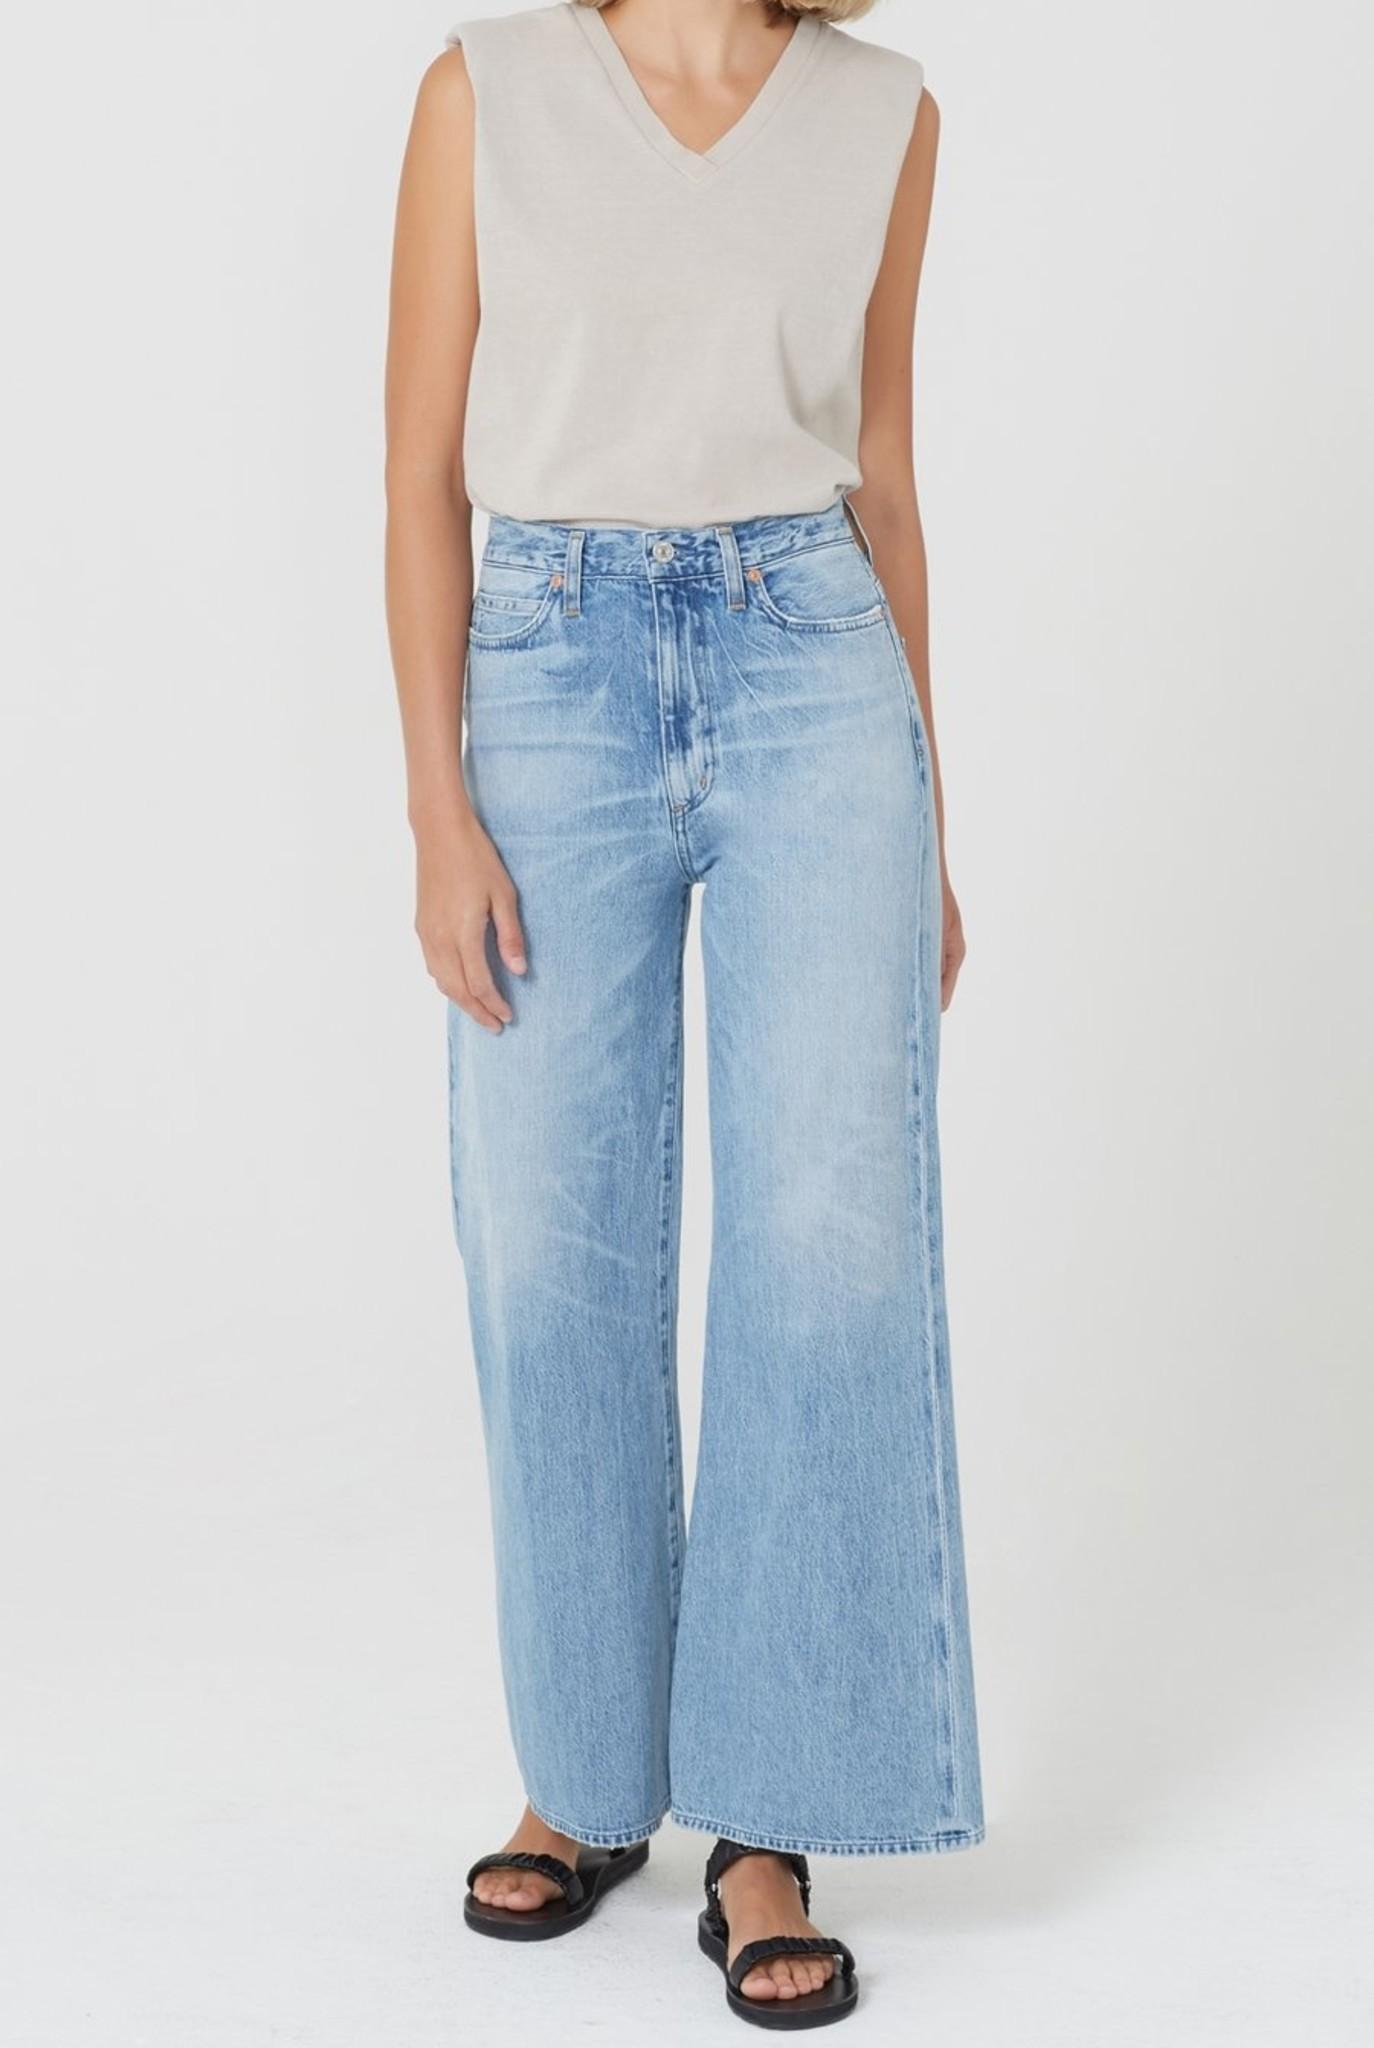 Rosanna Jeans Horizon